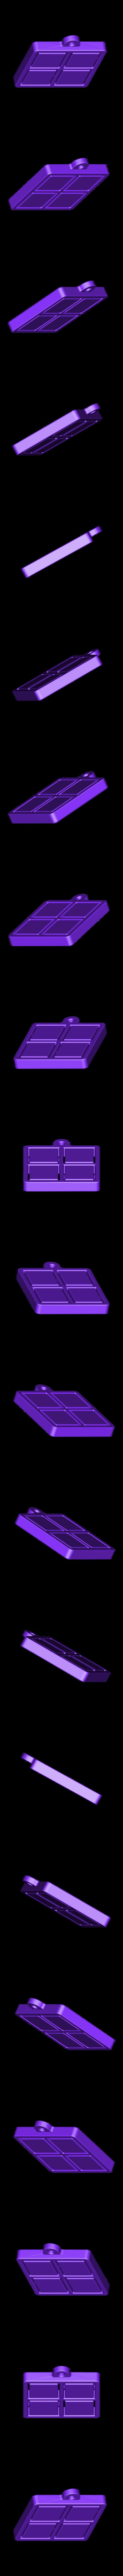 Keychain.obj Download free OBJ file Keychain • 3D printing template, 3DBuilder